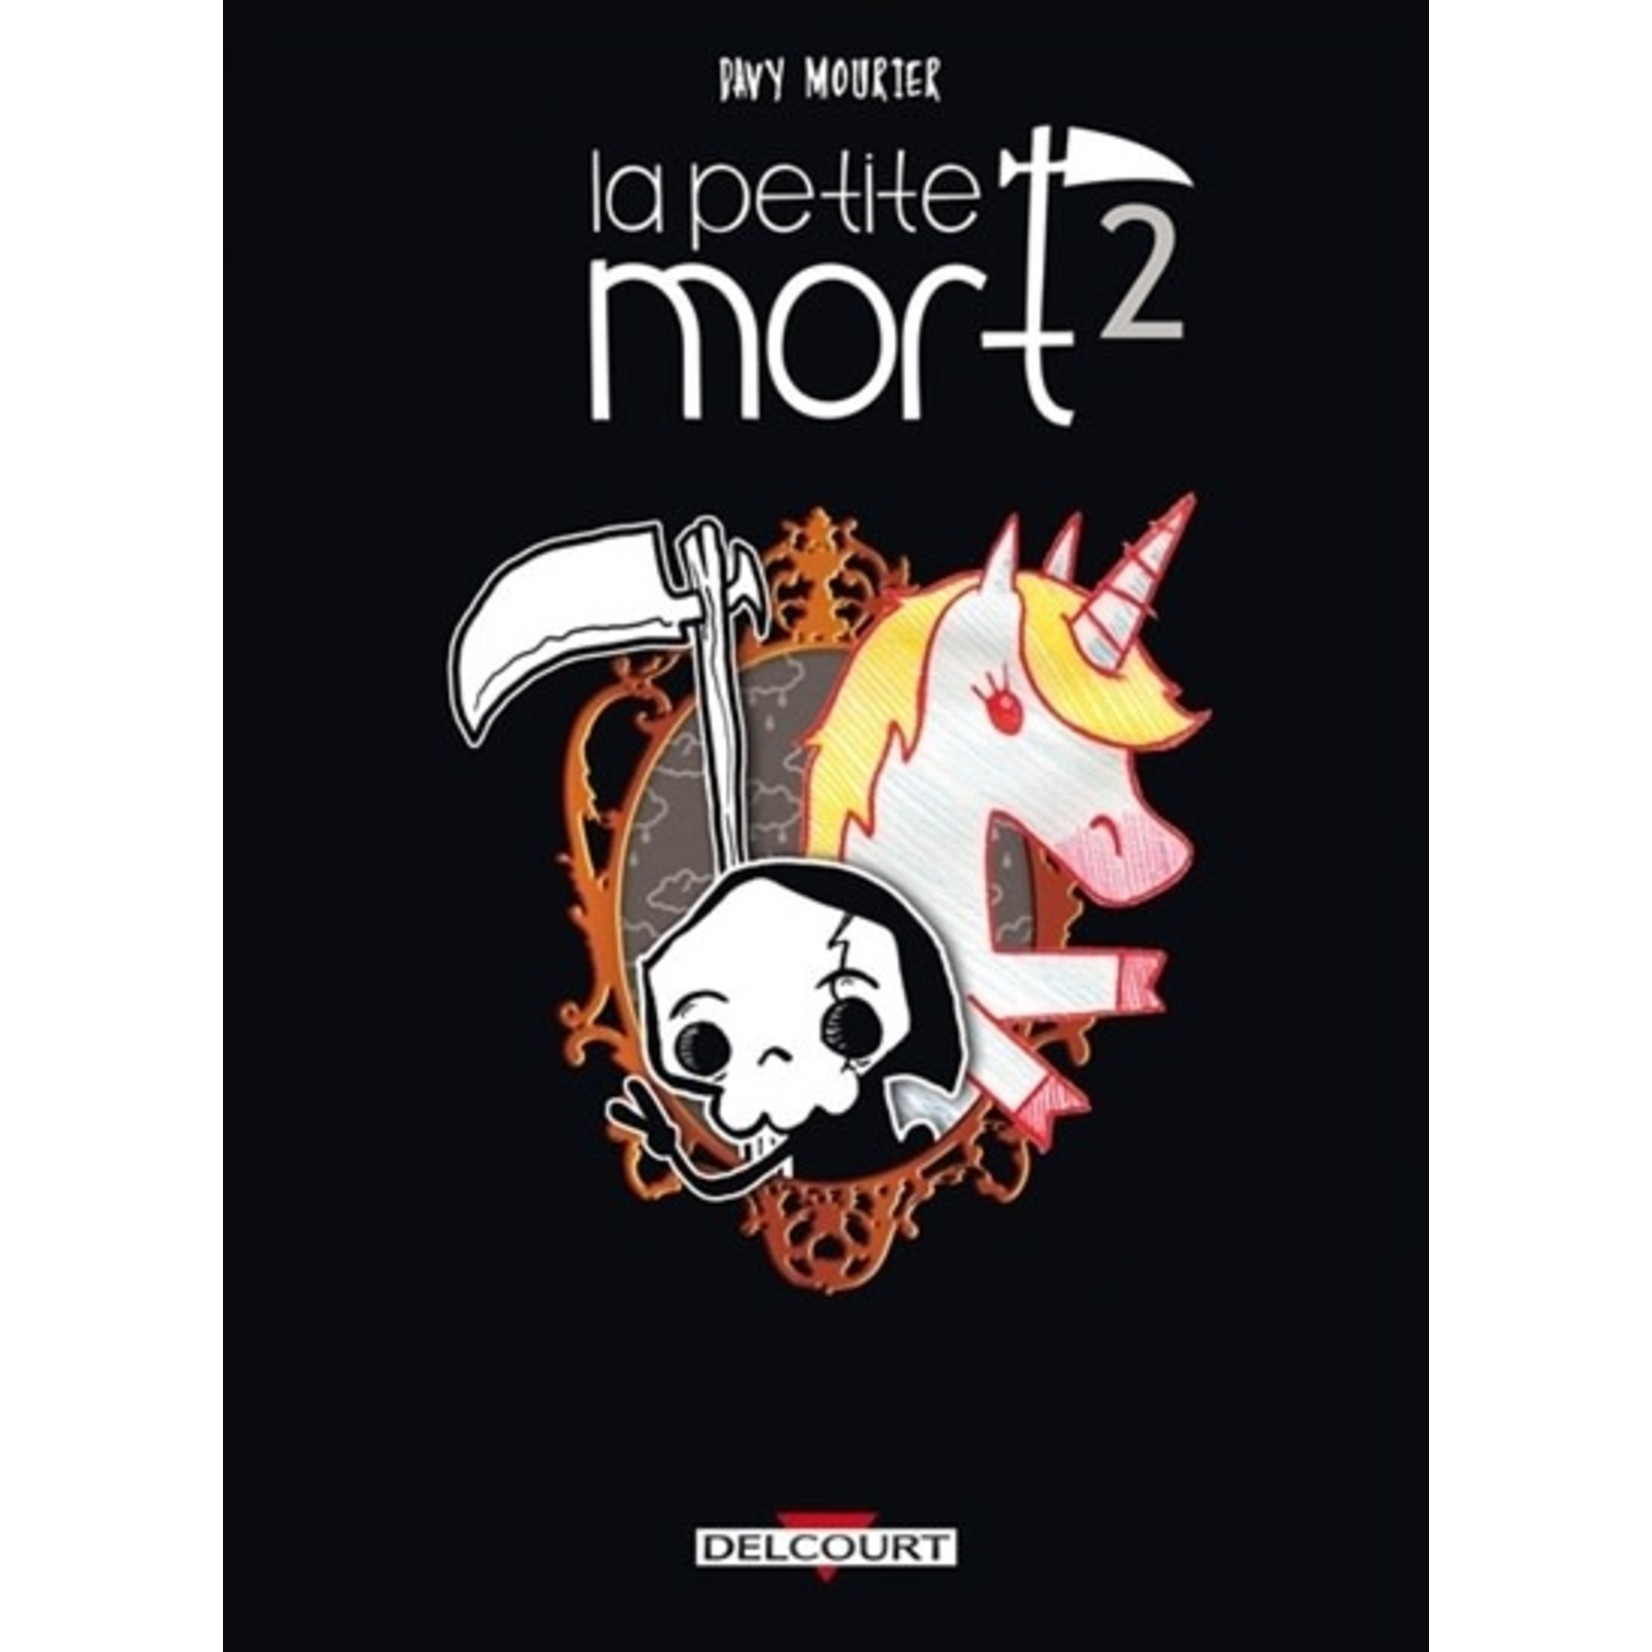 0-Delcourt La petite mort T.2 : Le secret de la licorne-sirène